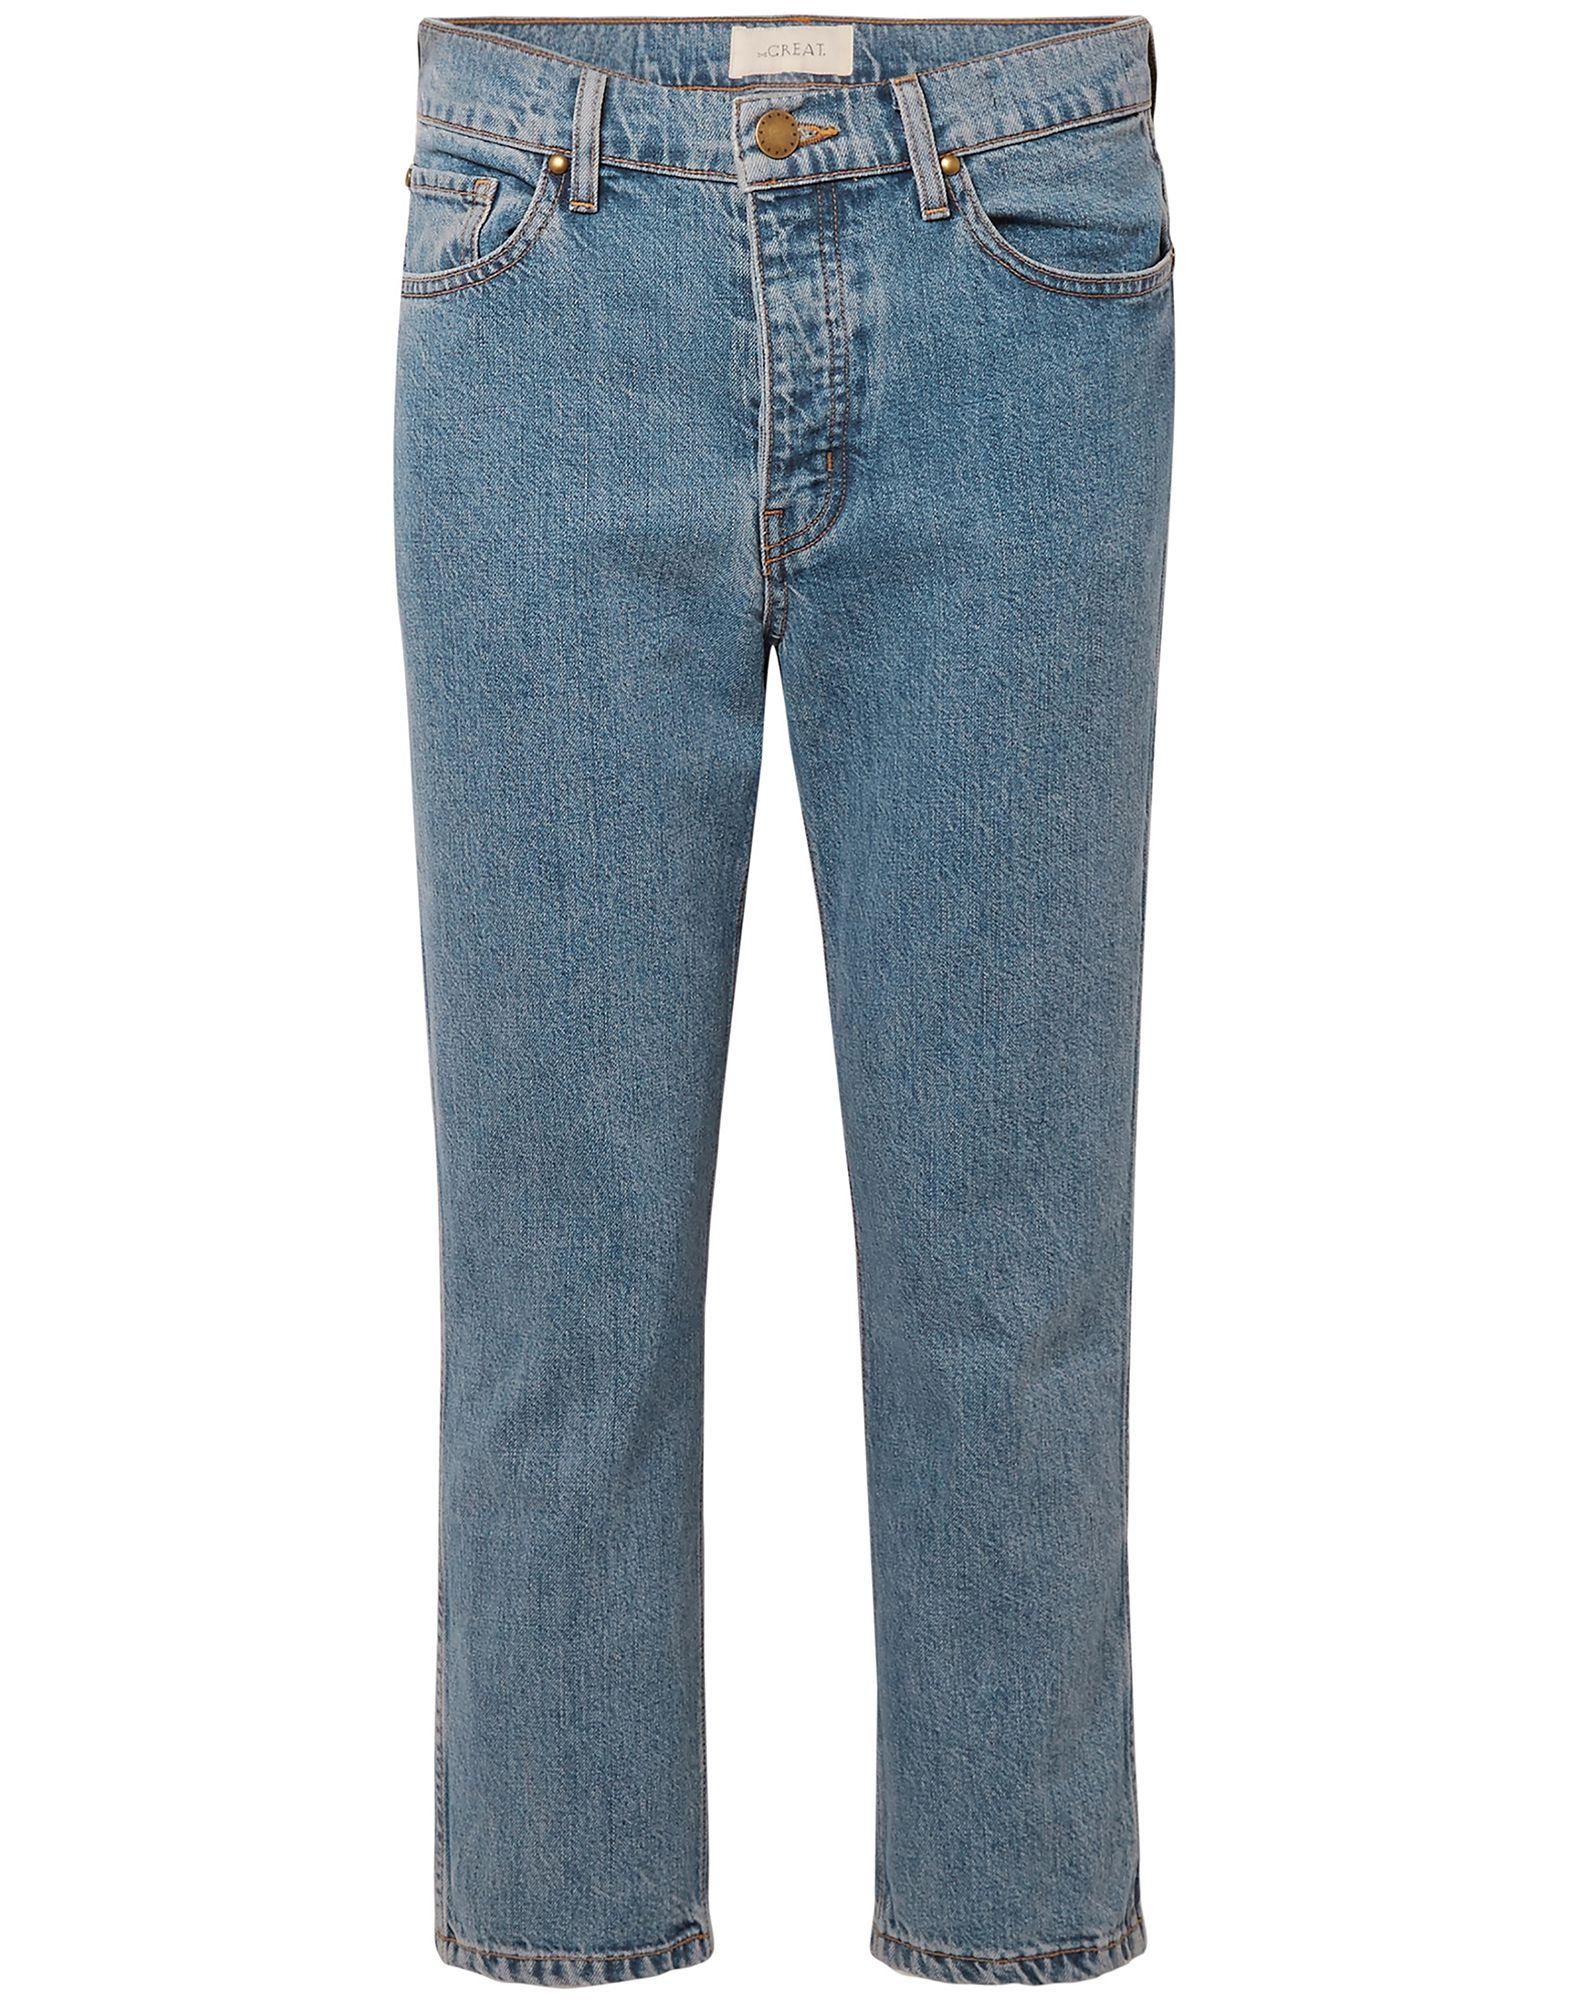 the great джинсовые брюки THE GREAT. Джинсовые брюки